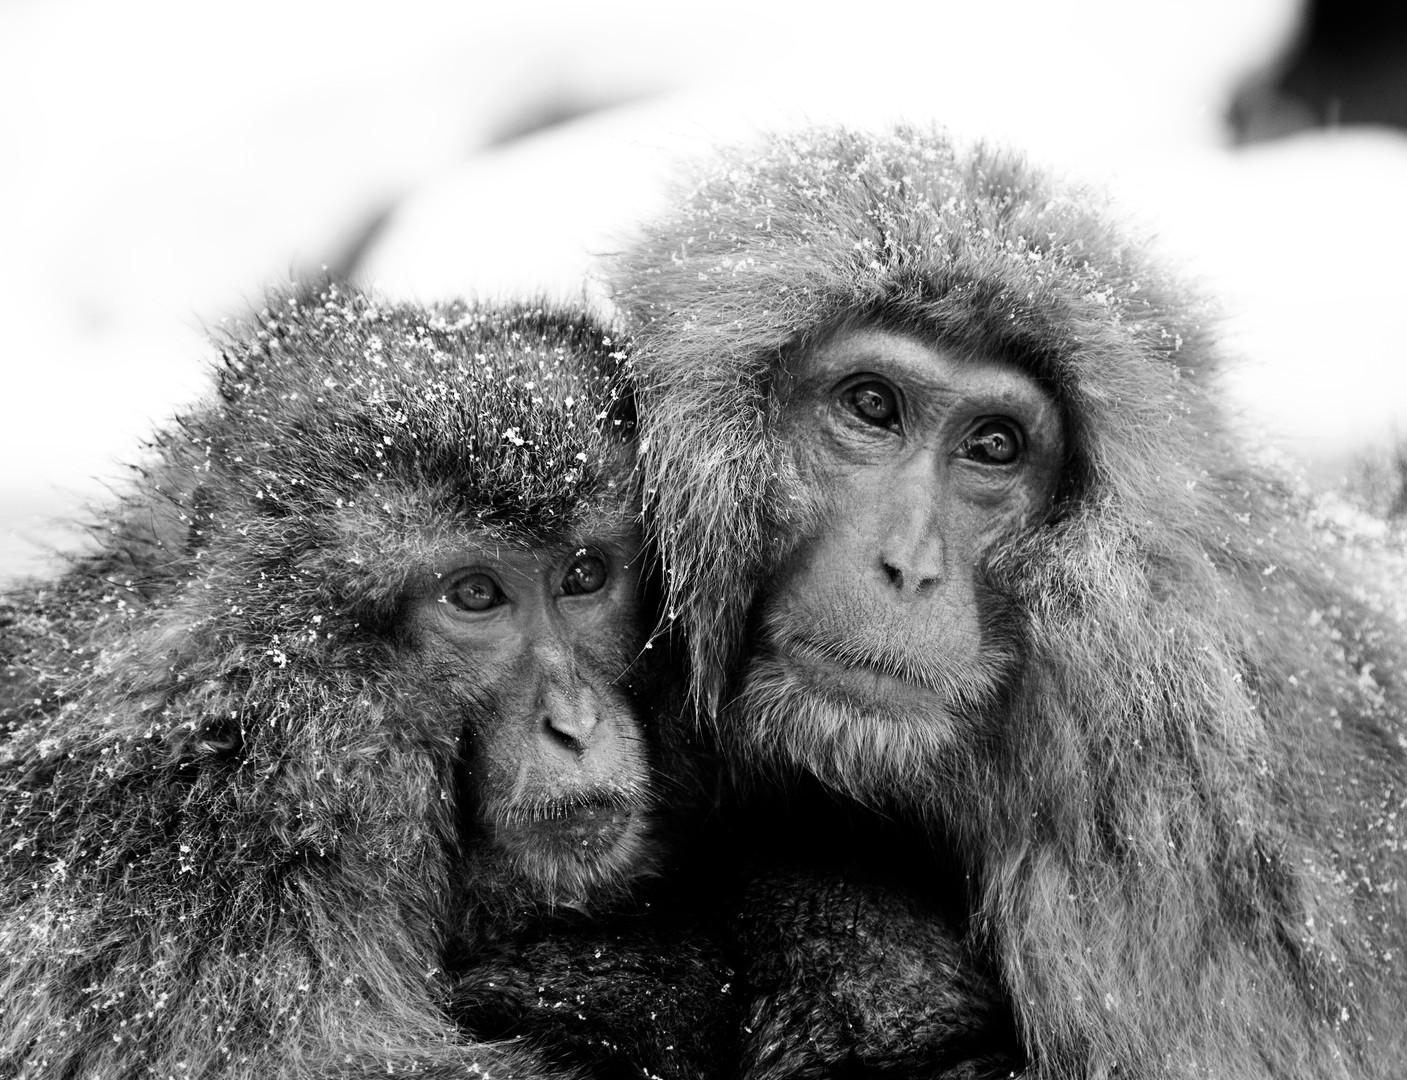 Two Snow Monkeys